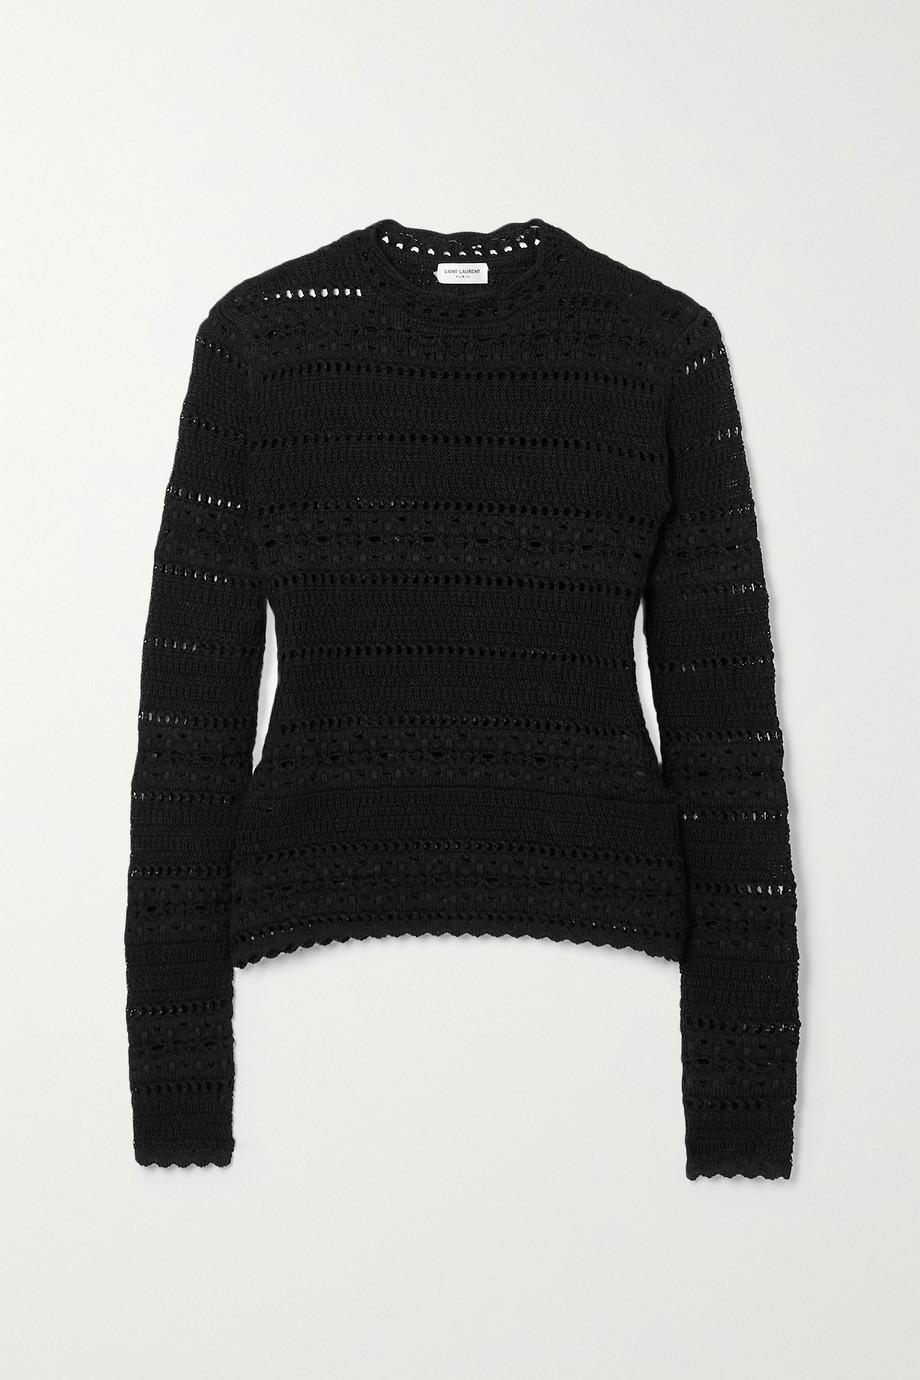 SAINT LAURENT Crocheted cotton sweater